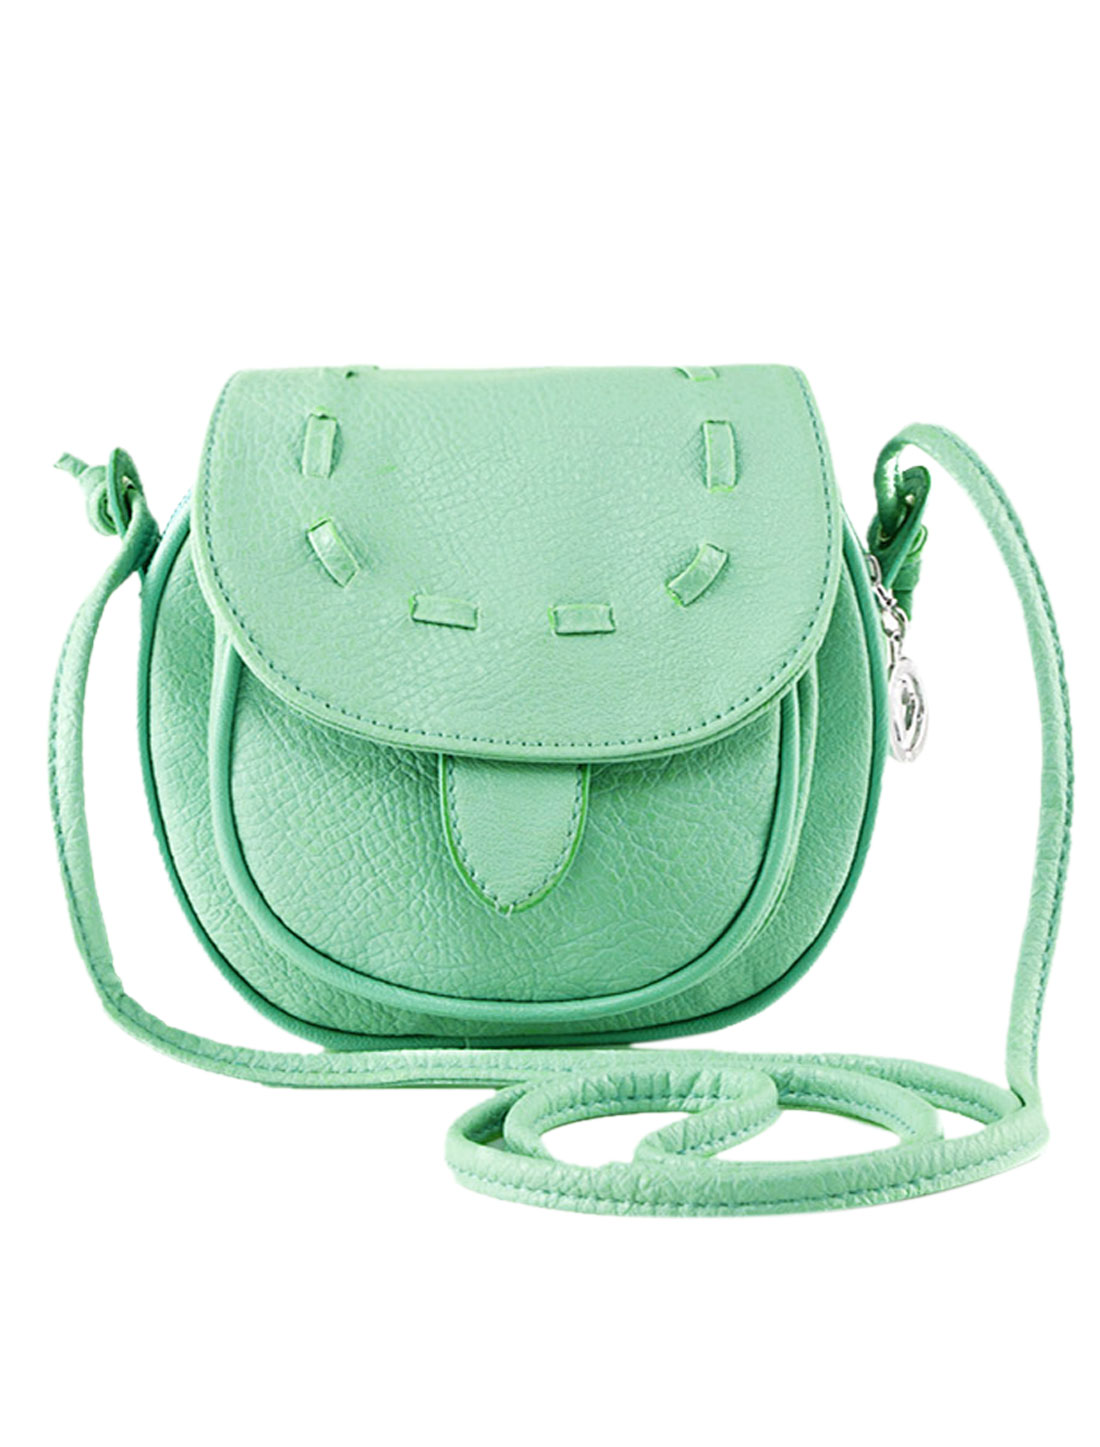 Ladies Stitching Flaptop Straps Mini Crossbody Bags Mint